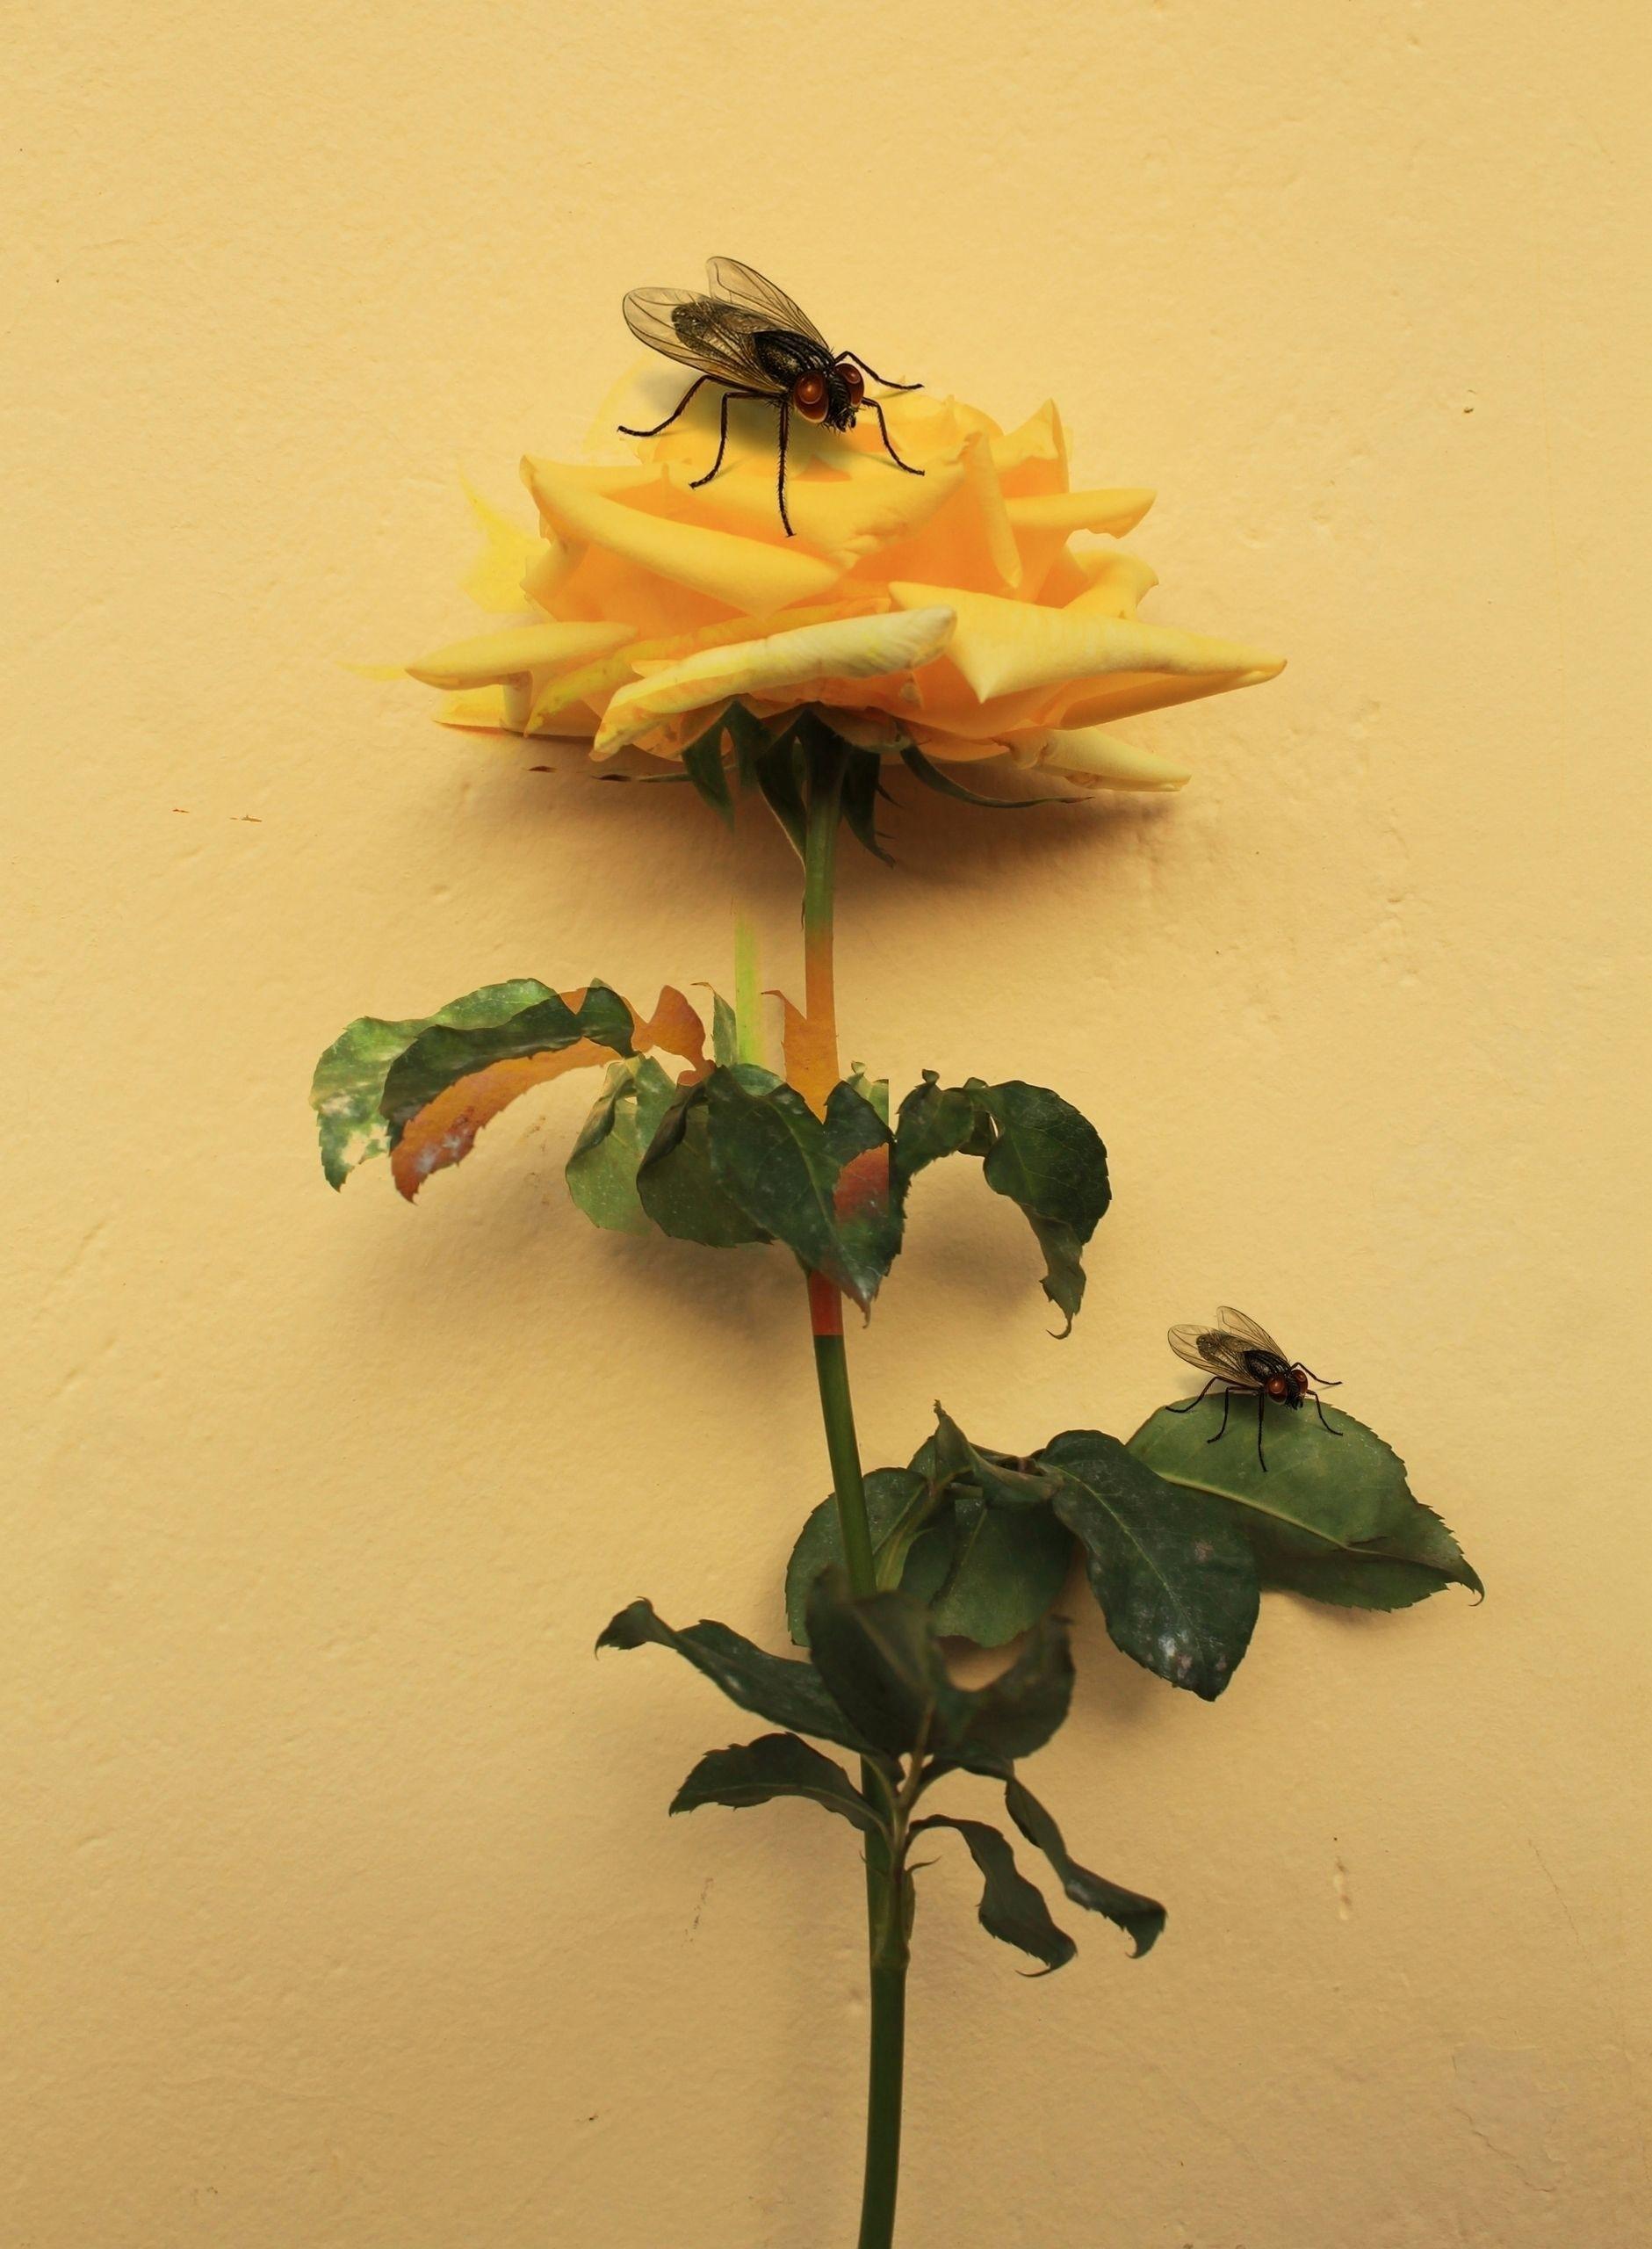 Spring - digitalcollage, flower - franalvez | ello